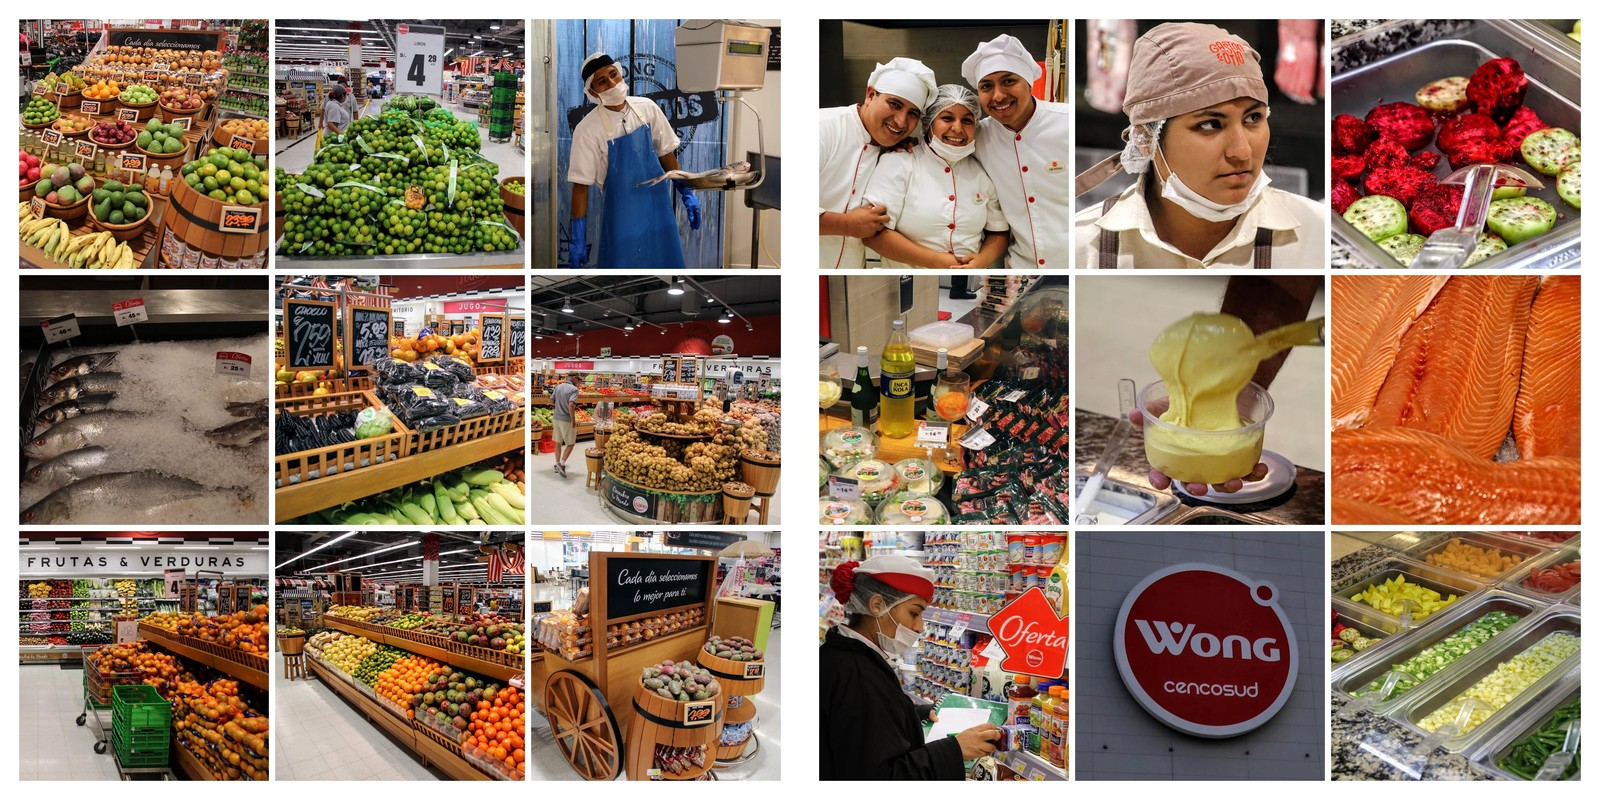 07 Supermarket WONG pe Plaja Asia